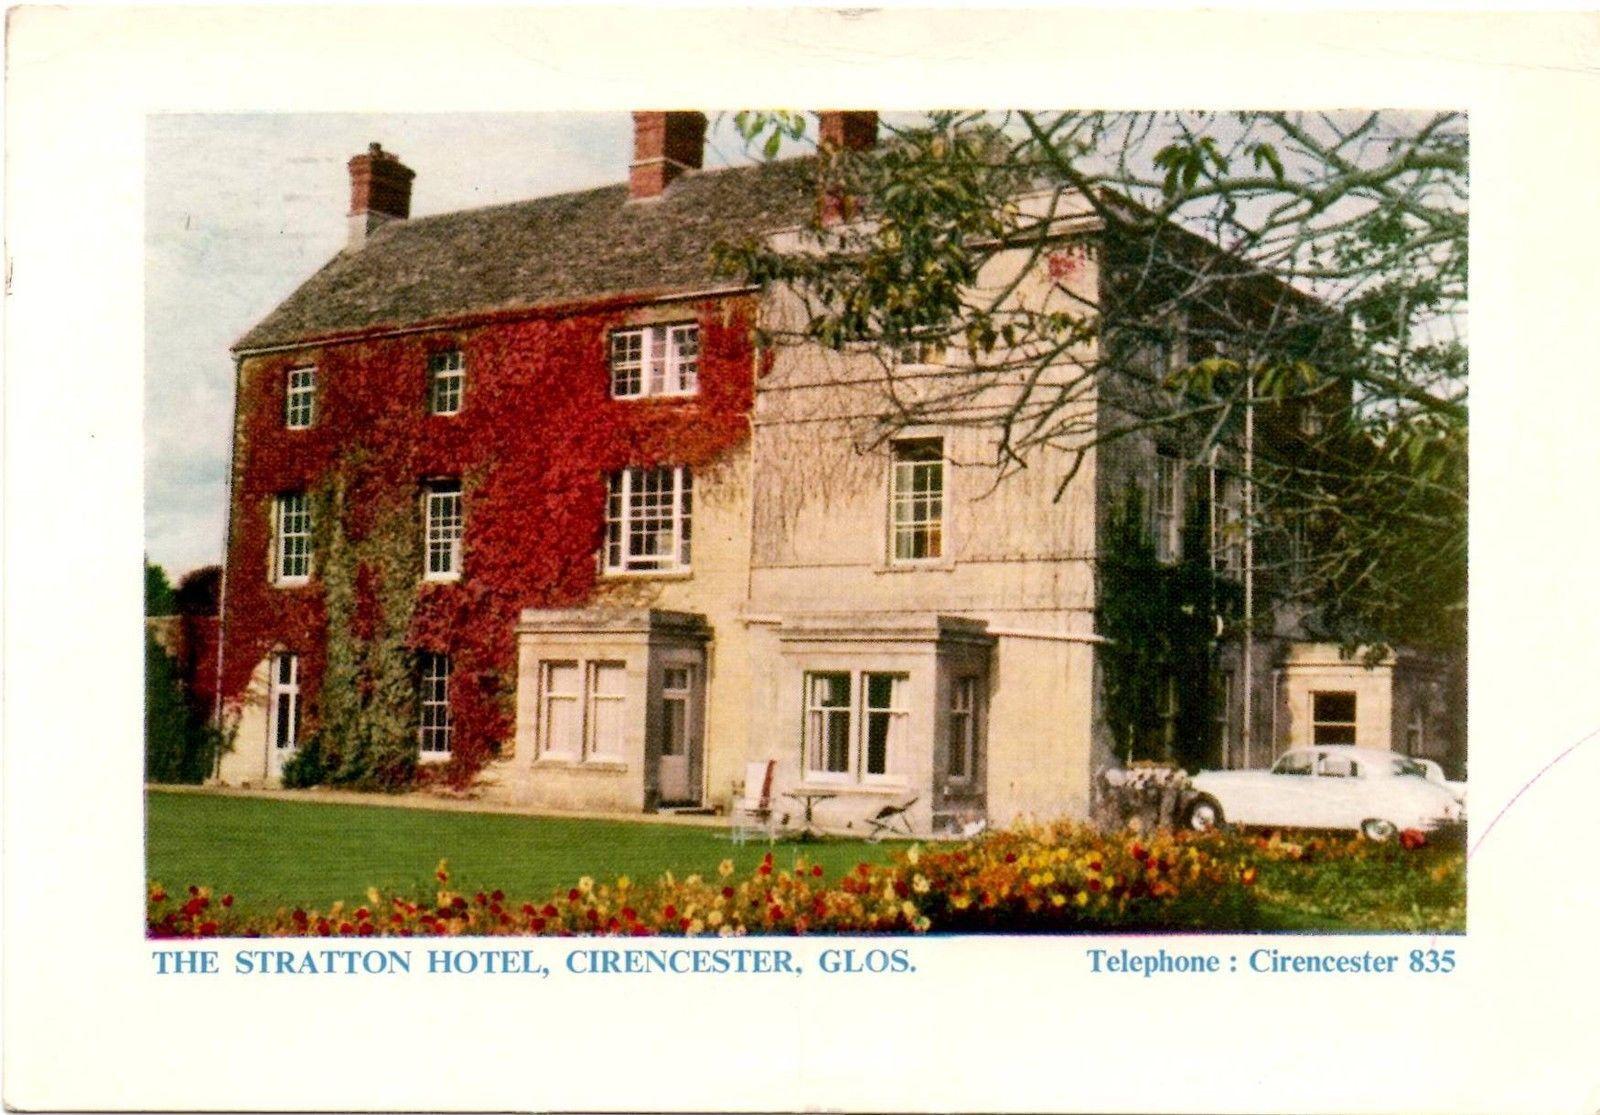 Stratton Hotel Cirencester Gloucestershire Postcard 1964 Ebay